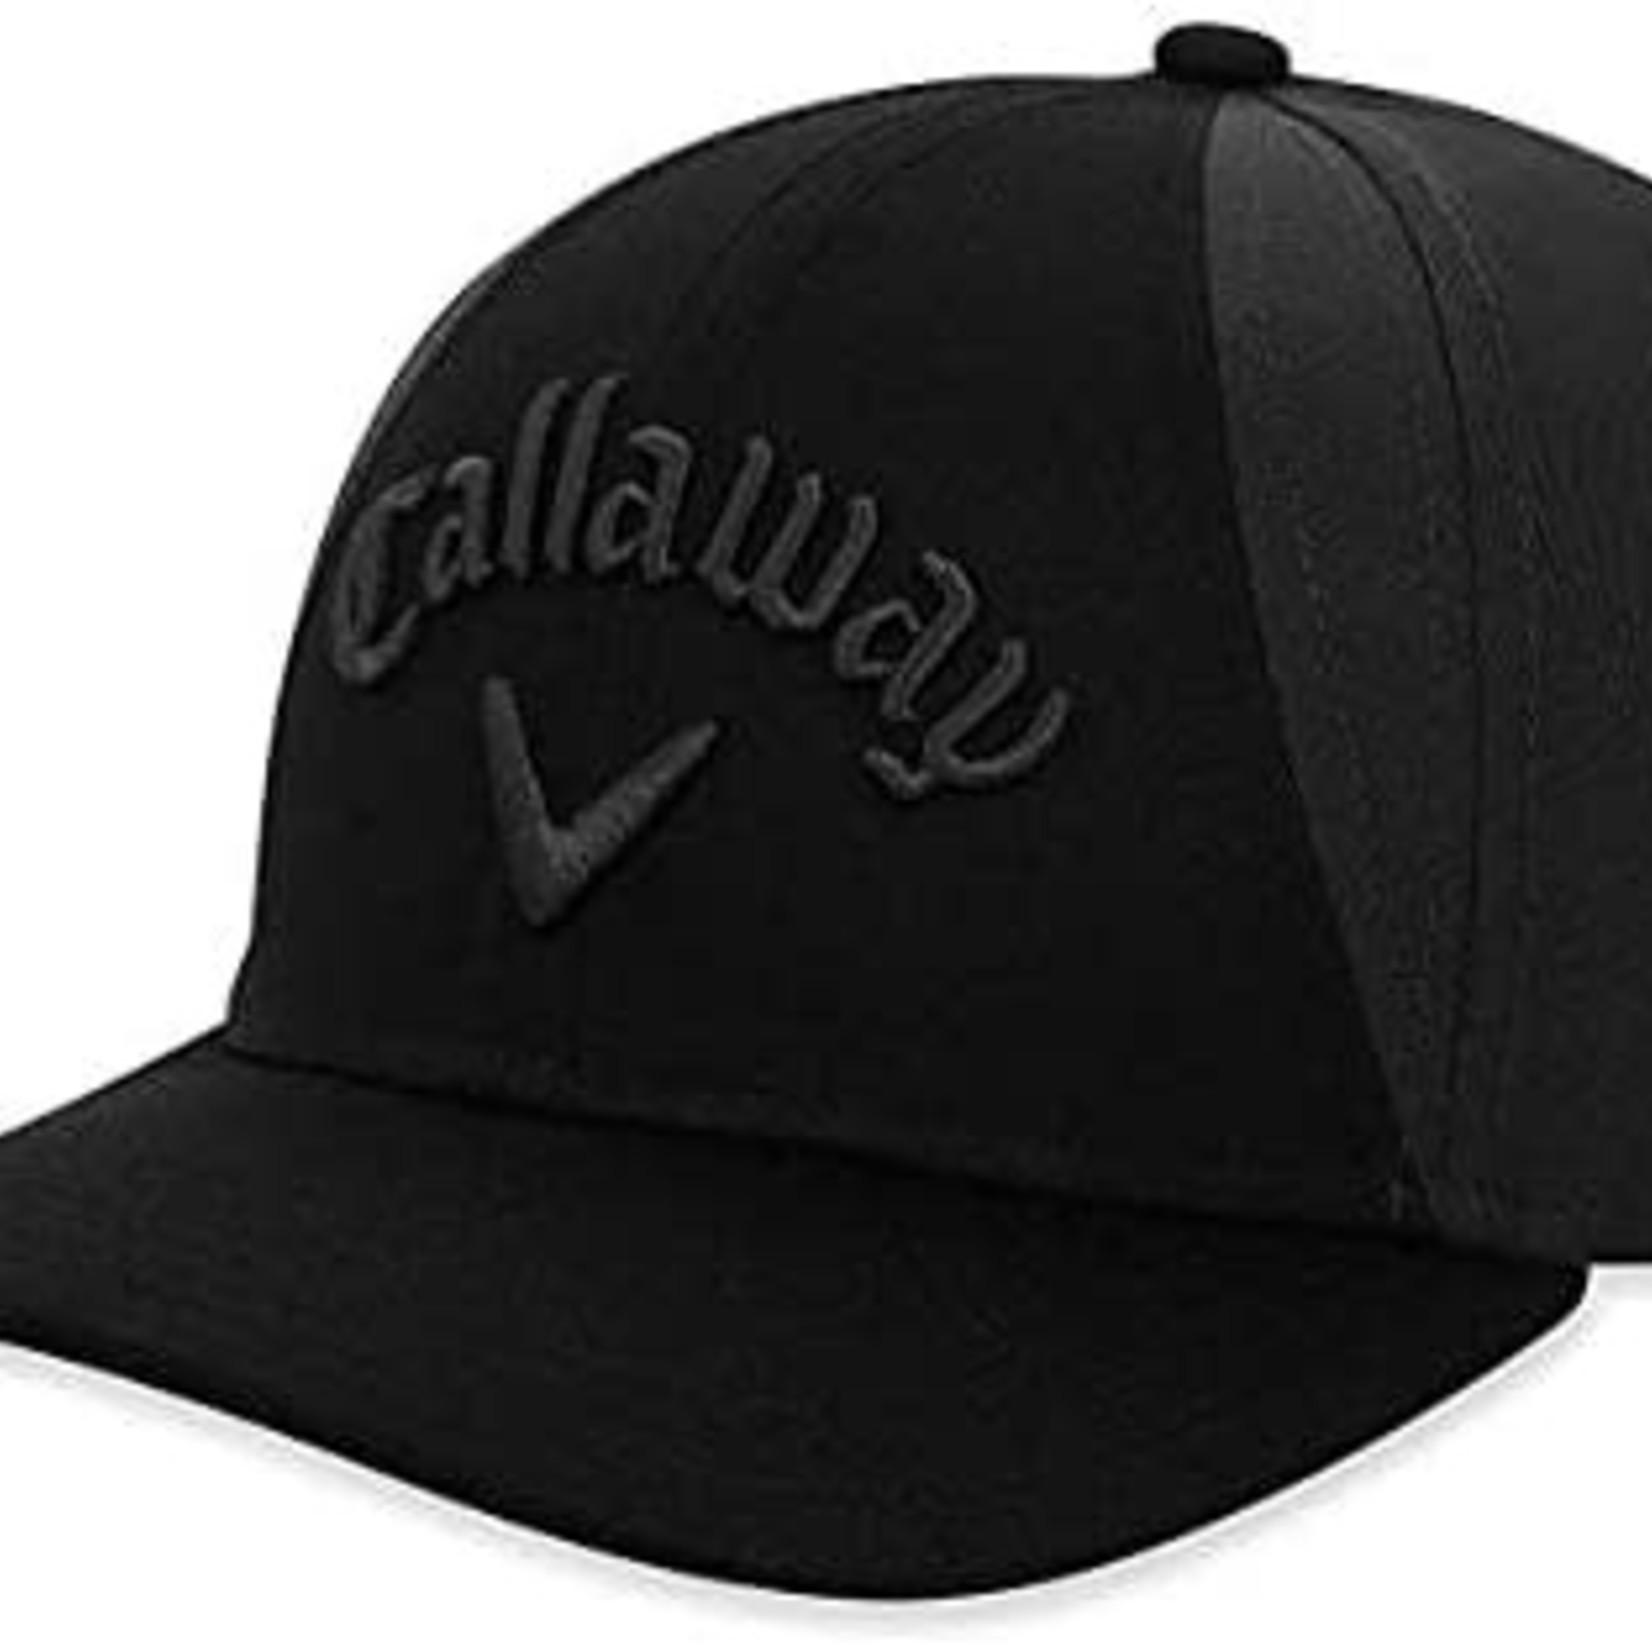 Callaway Callaway Ballpark ADJ. Hat